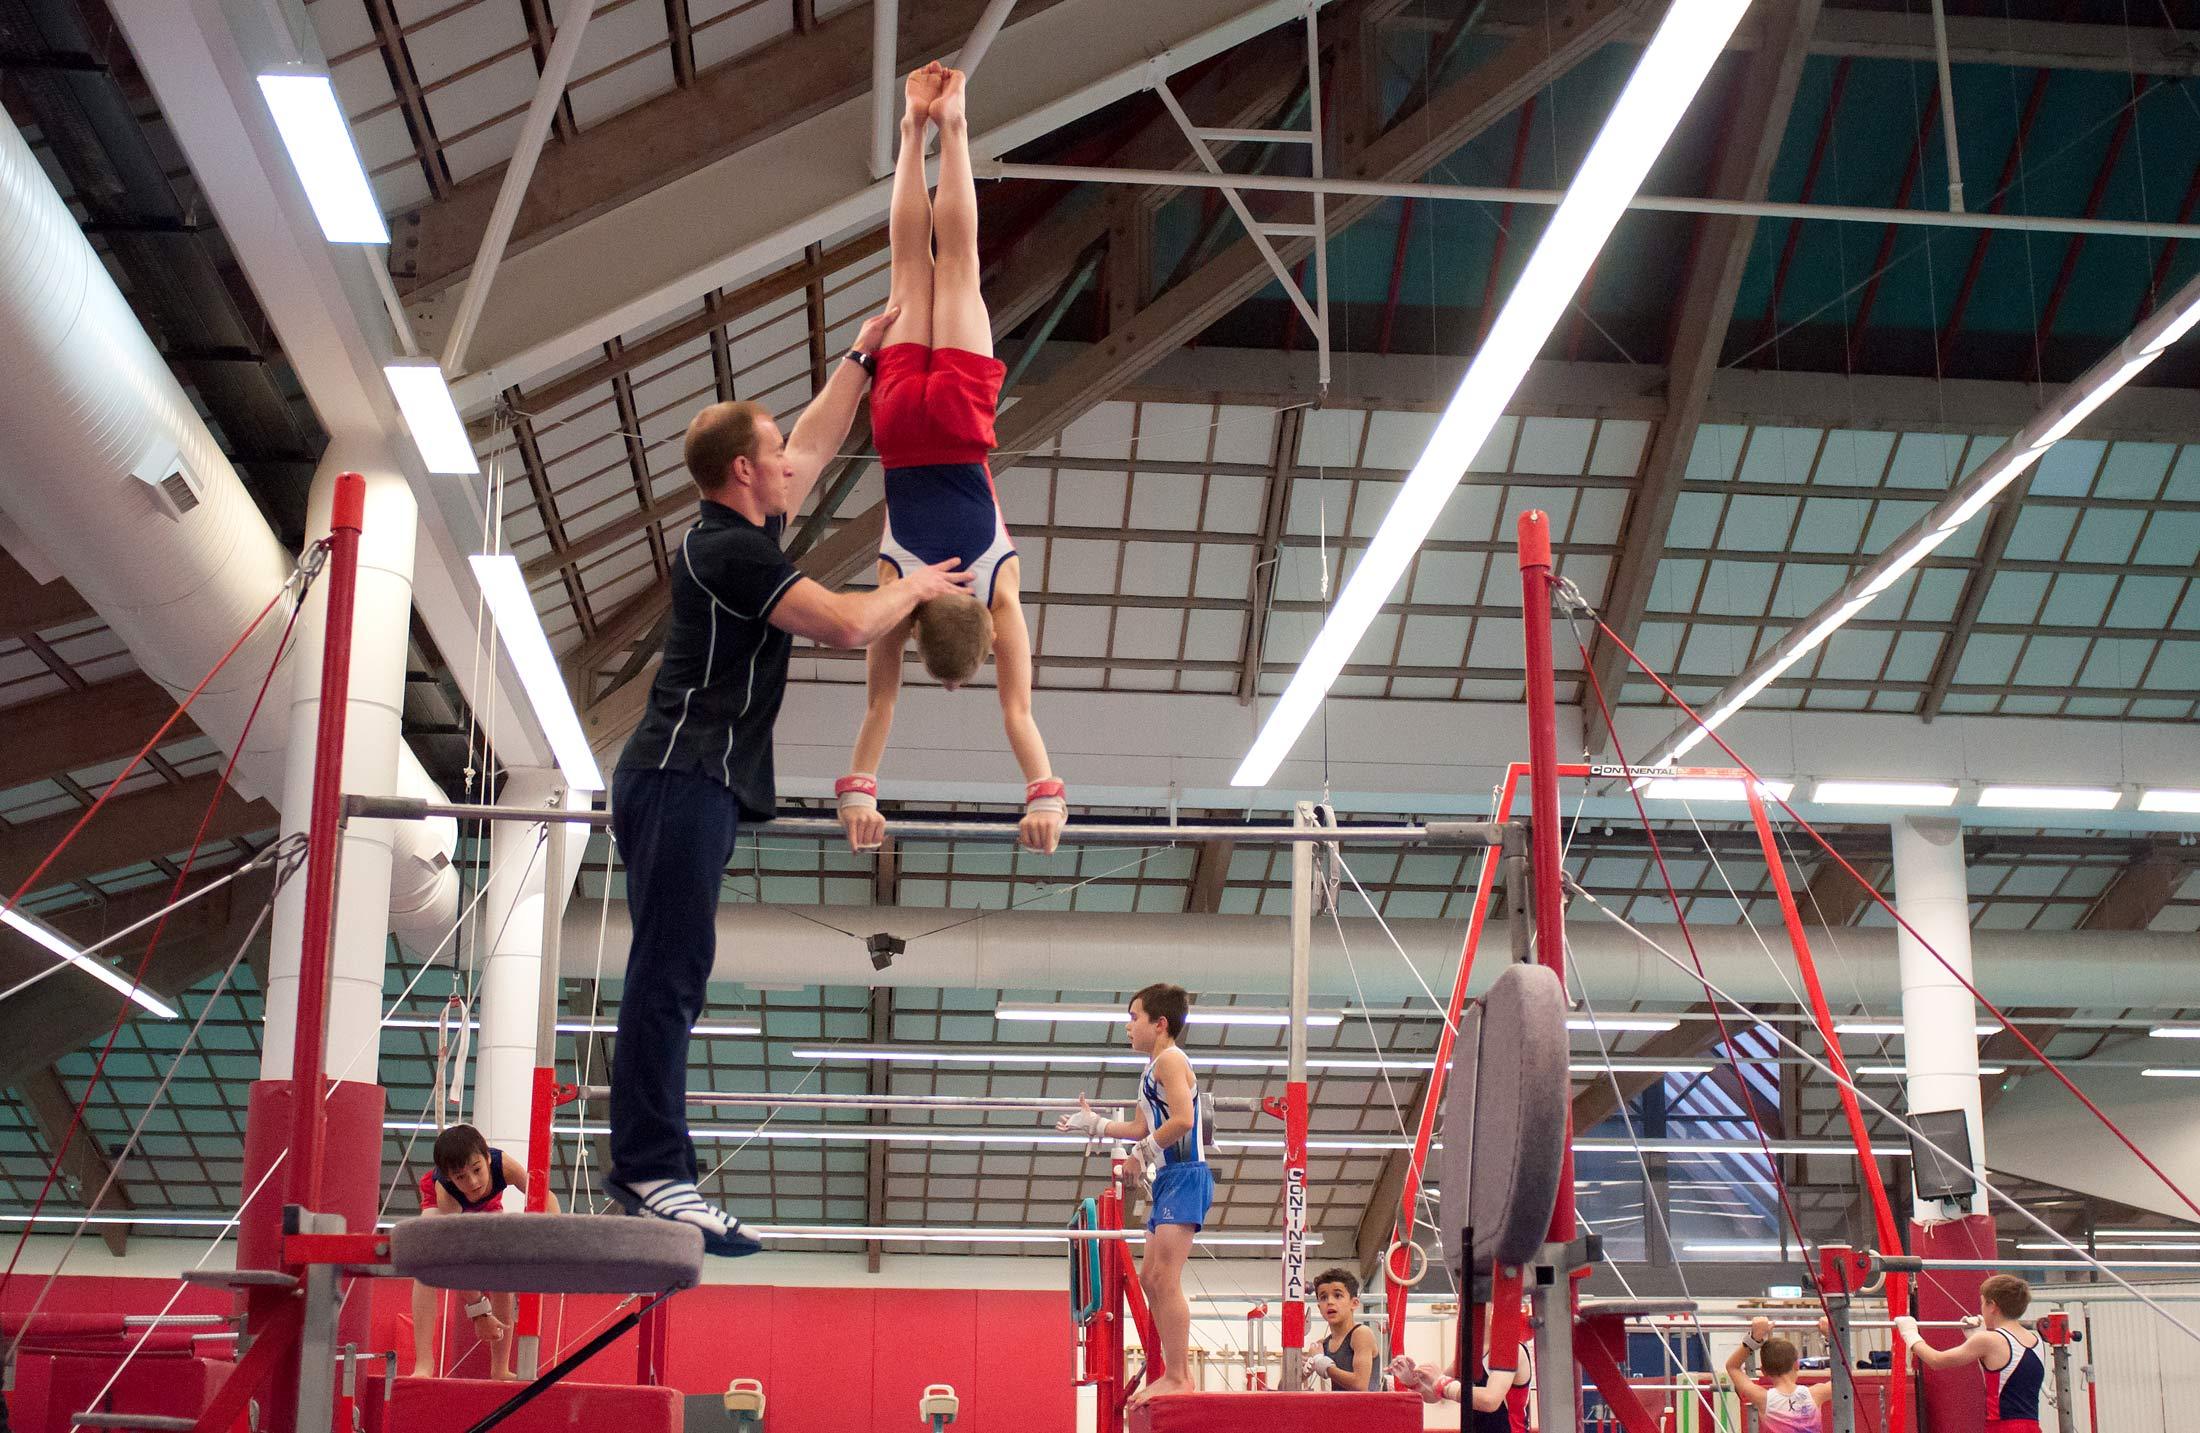 gymnast and coach handstand on high bar